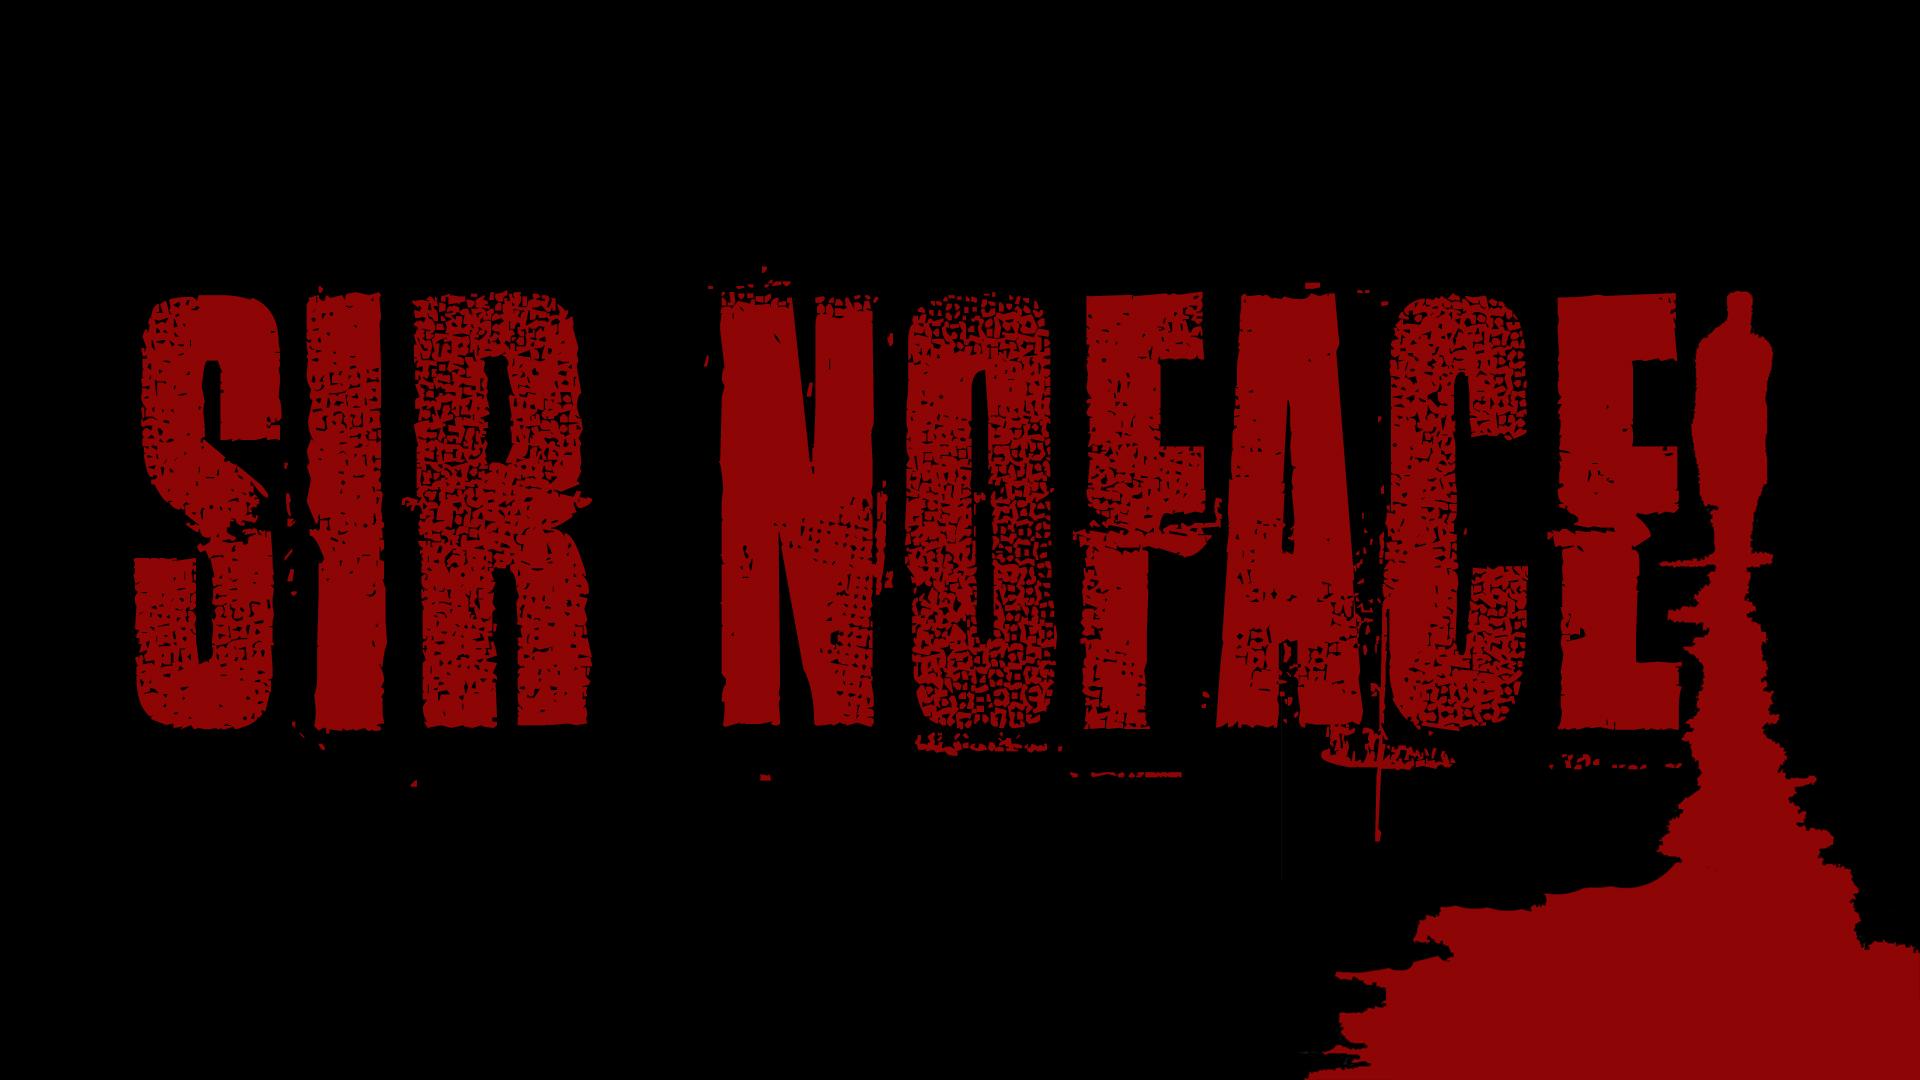 Sir Noface